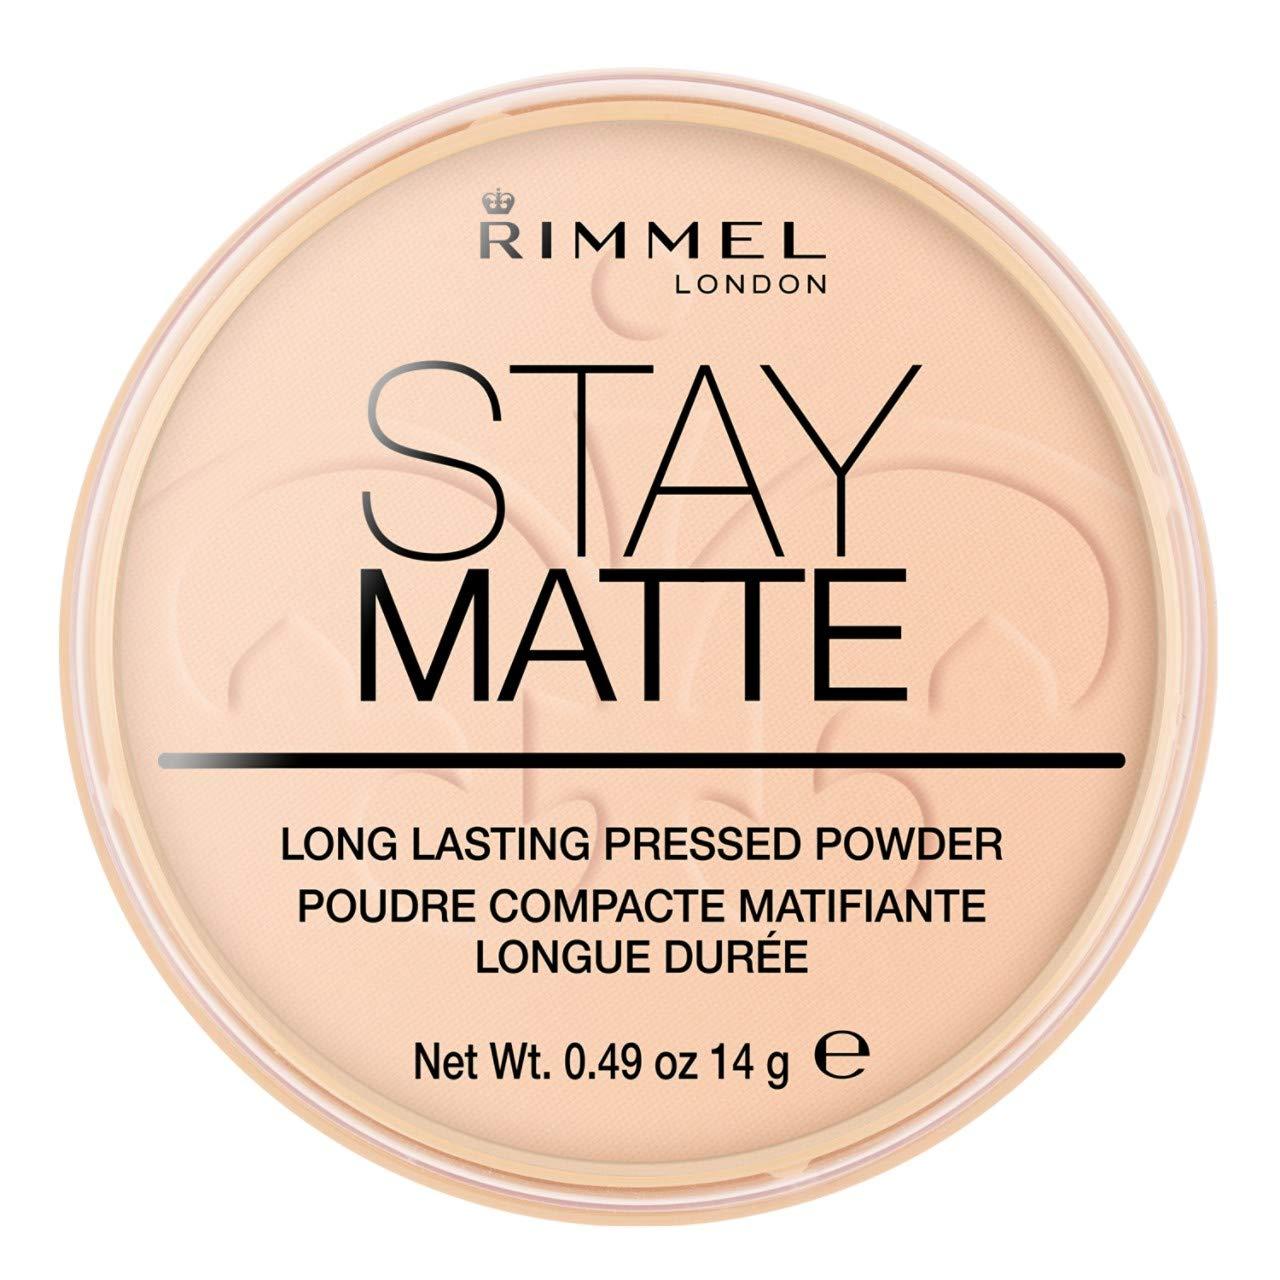 Rimmel London Stay Matte Pressed Powder, 6 Warm Beige, 14 g